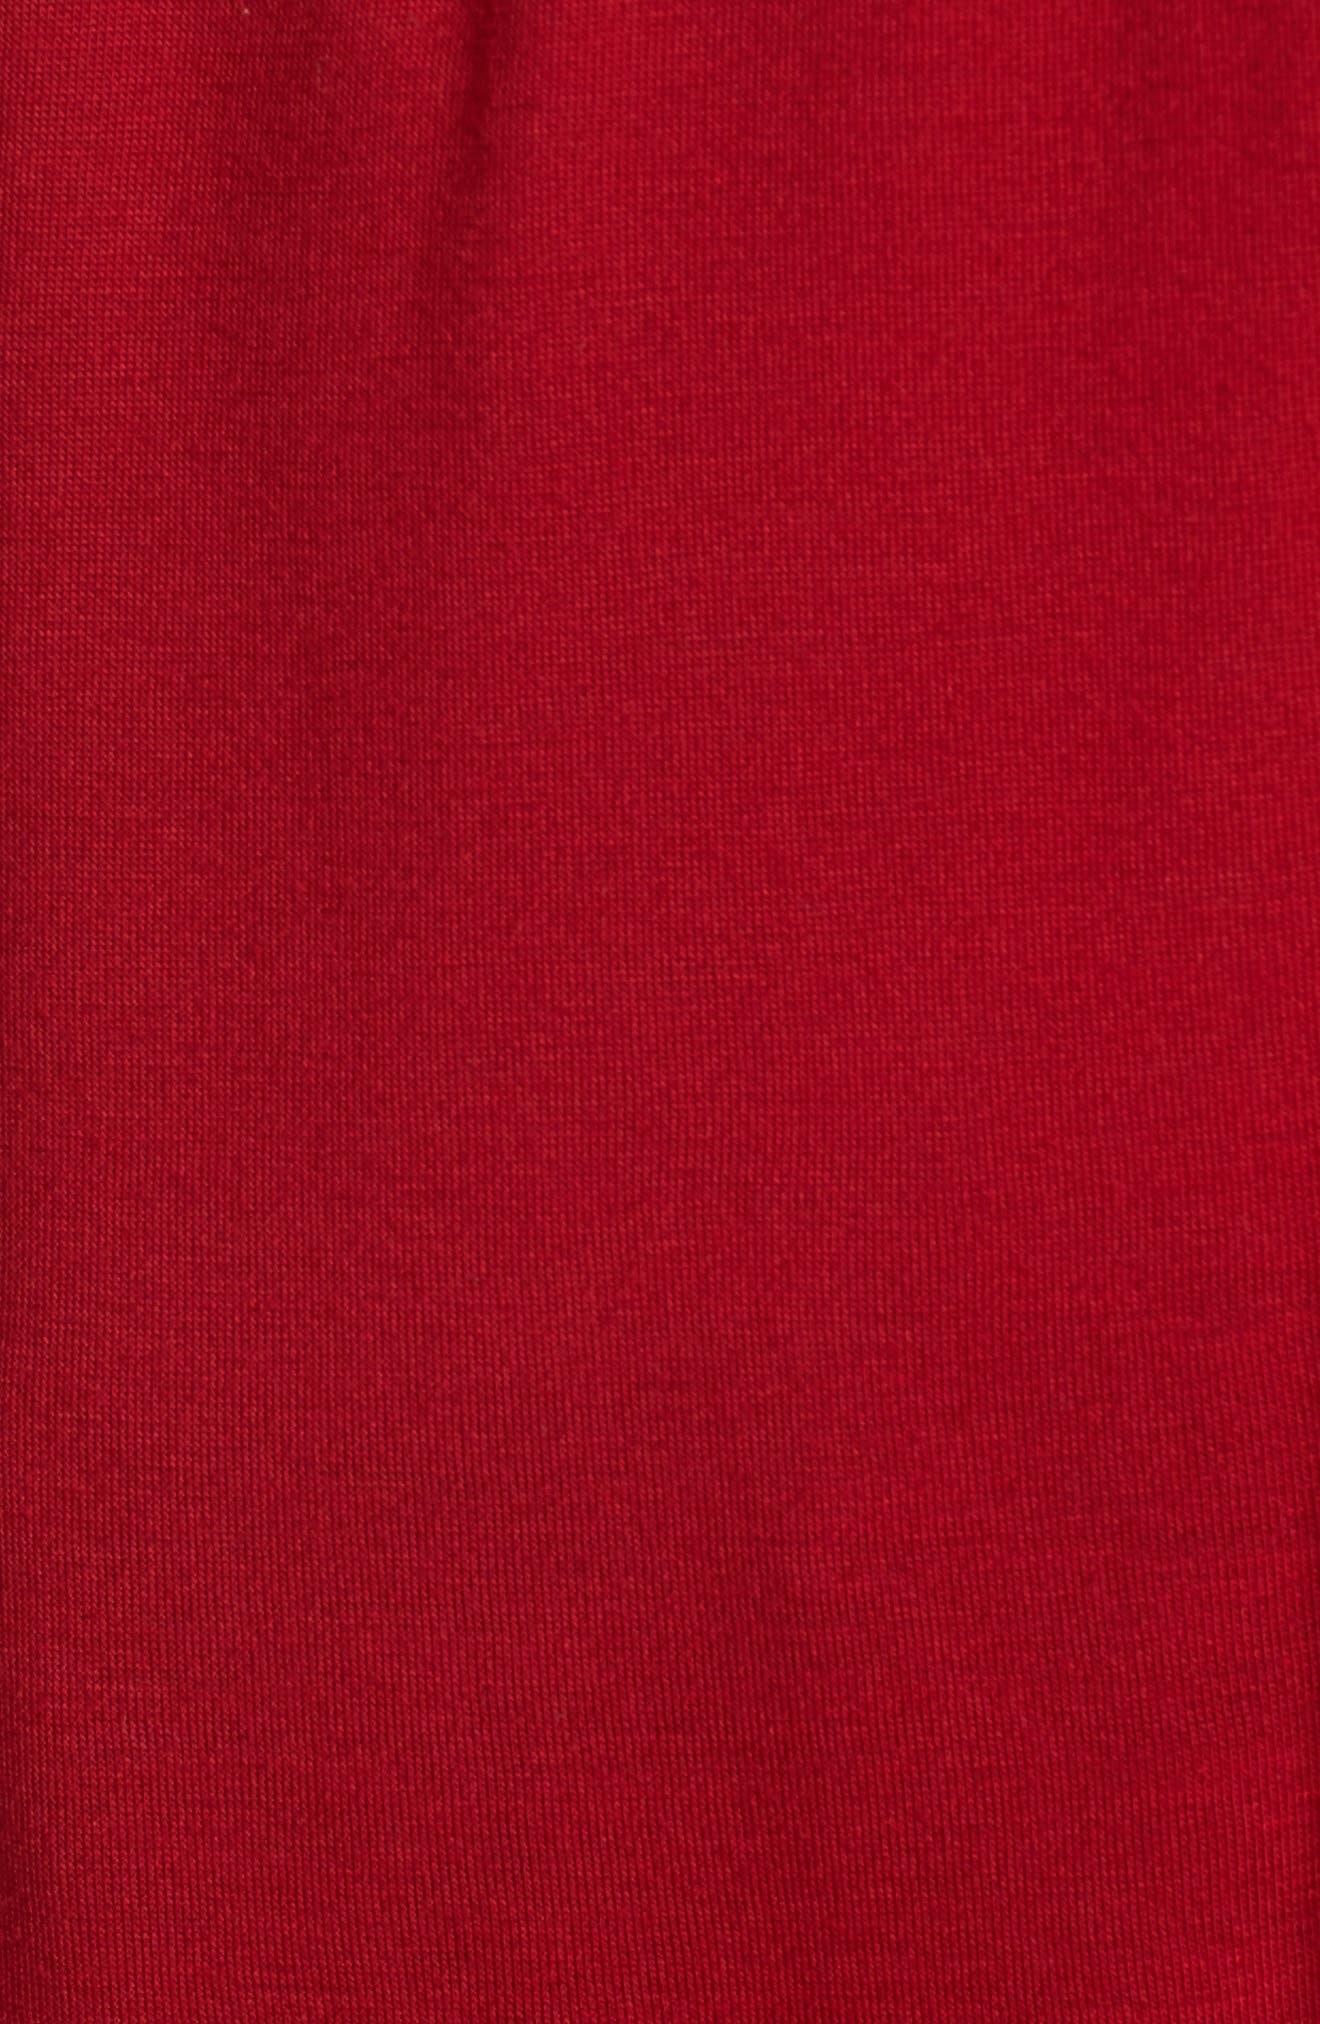 Luck Off the Shoulder Top,                             Alternate thumbnail 5, color,                             Crimson